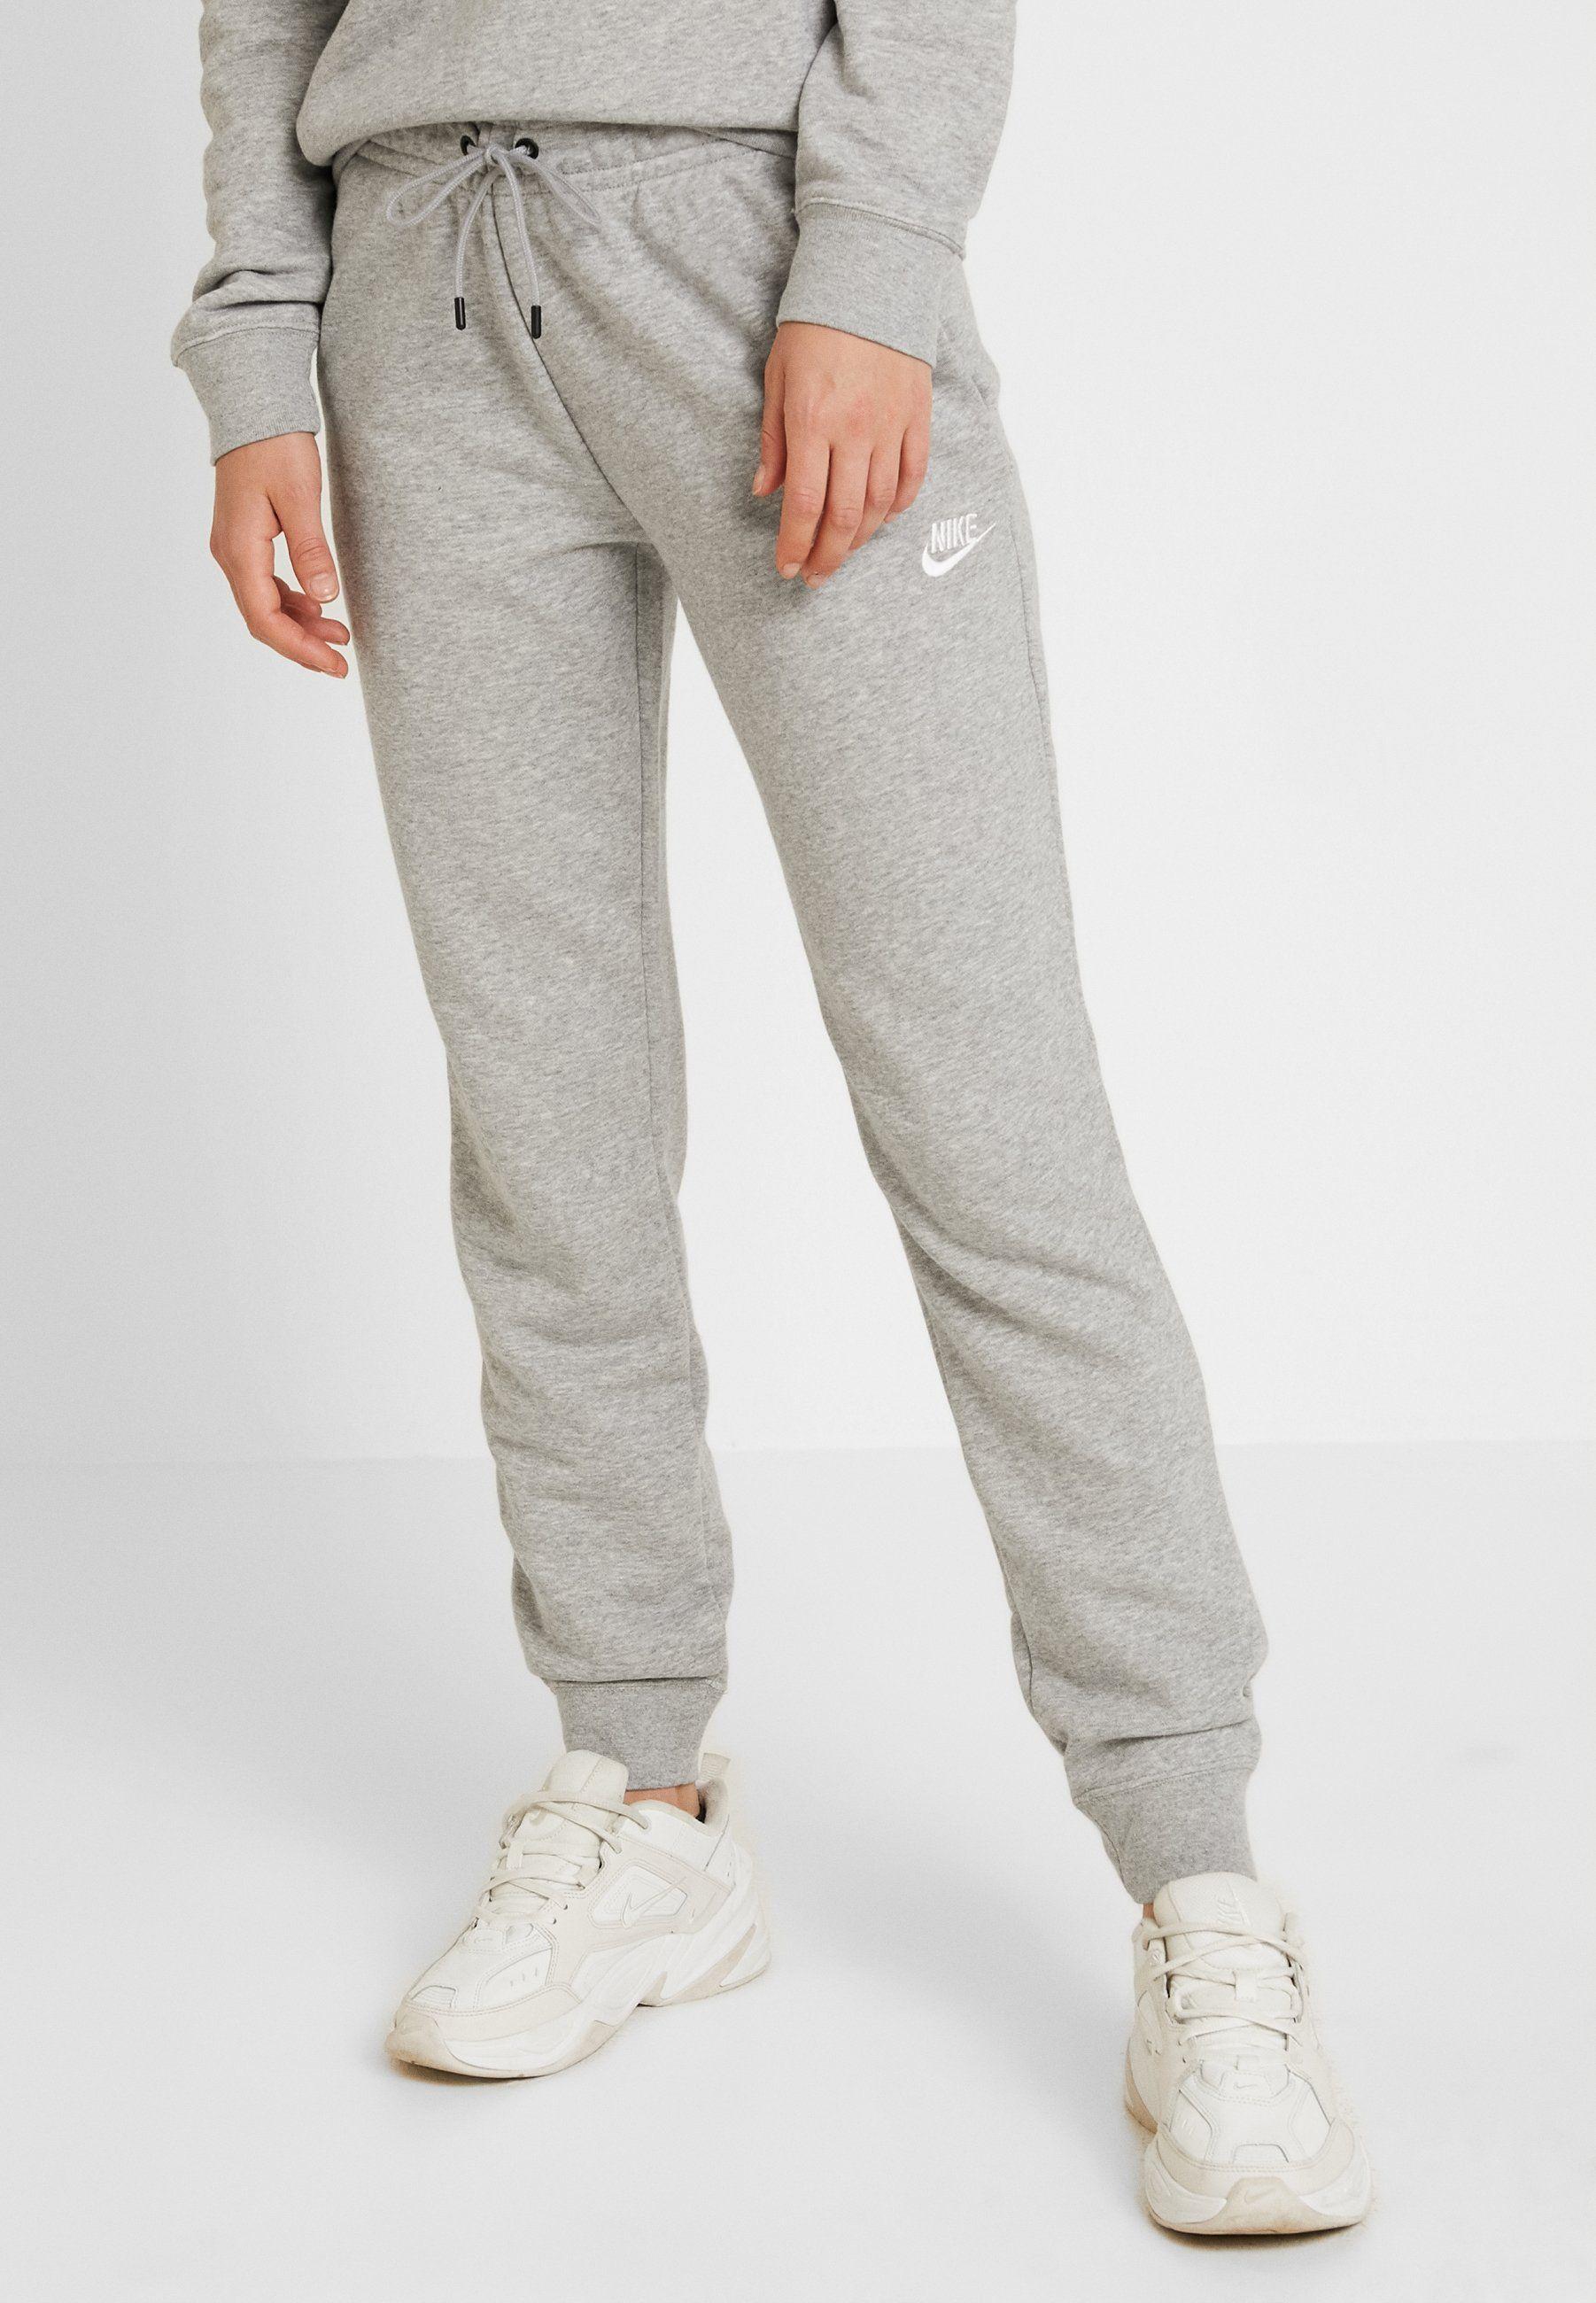 Nike Sportswear Joggebukse Grey Heather White Gra Zalando No Klaer Nike Sportswear Joggebukse [ 2600 x 1802 Pixel ]